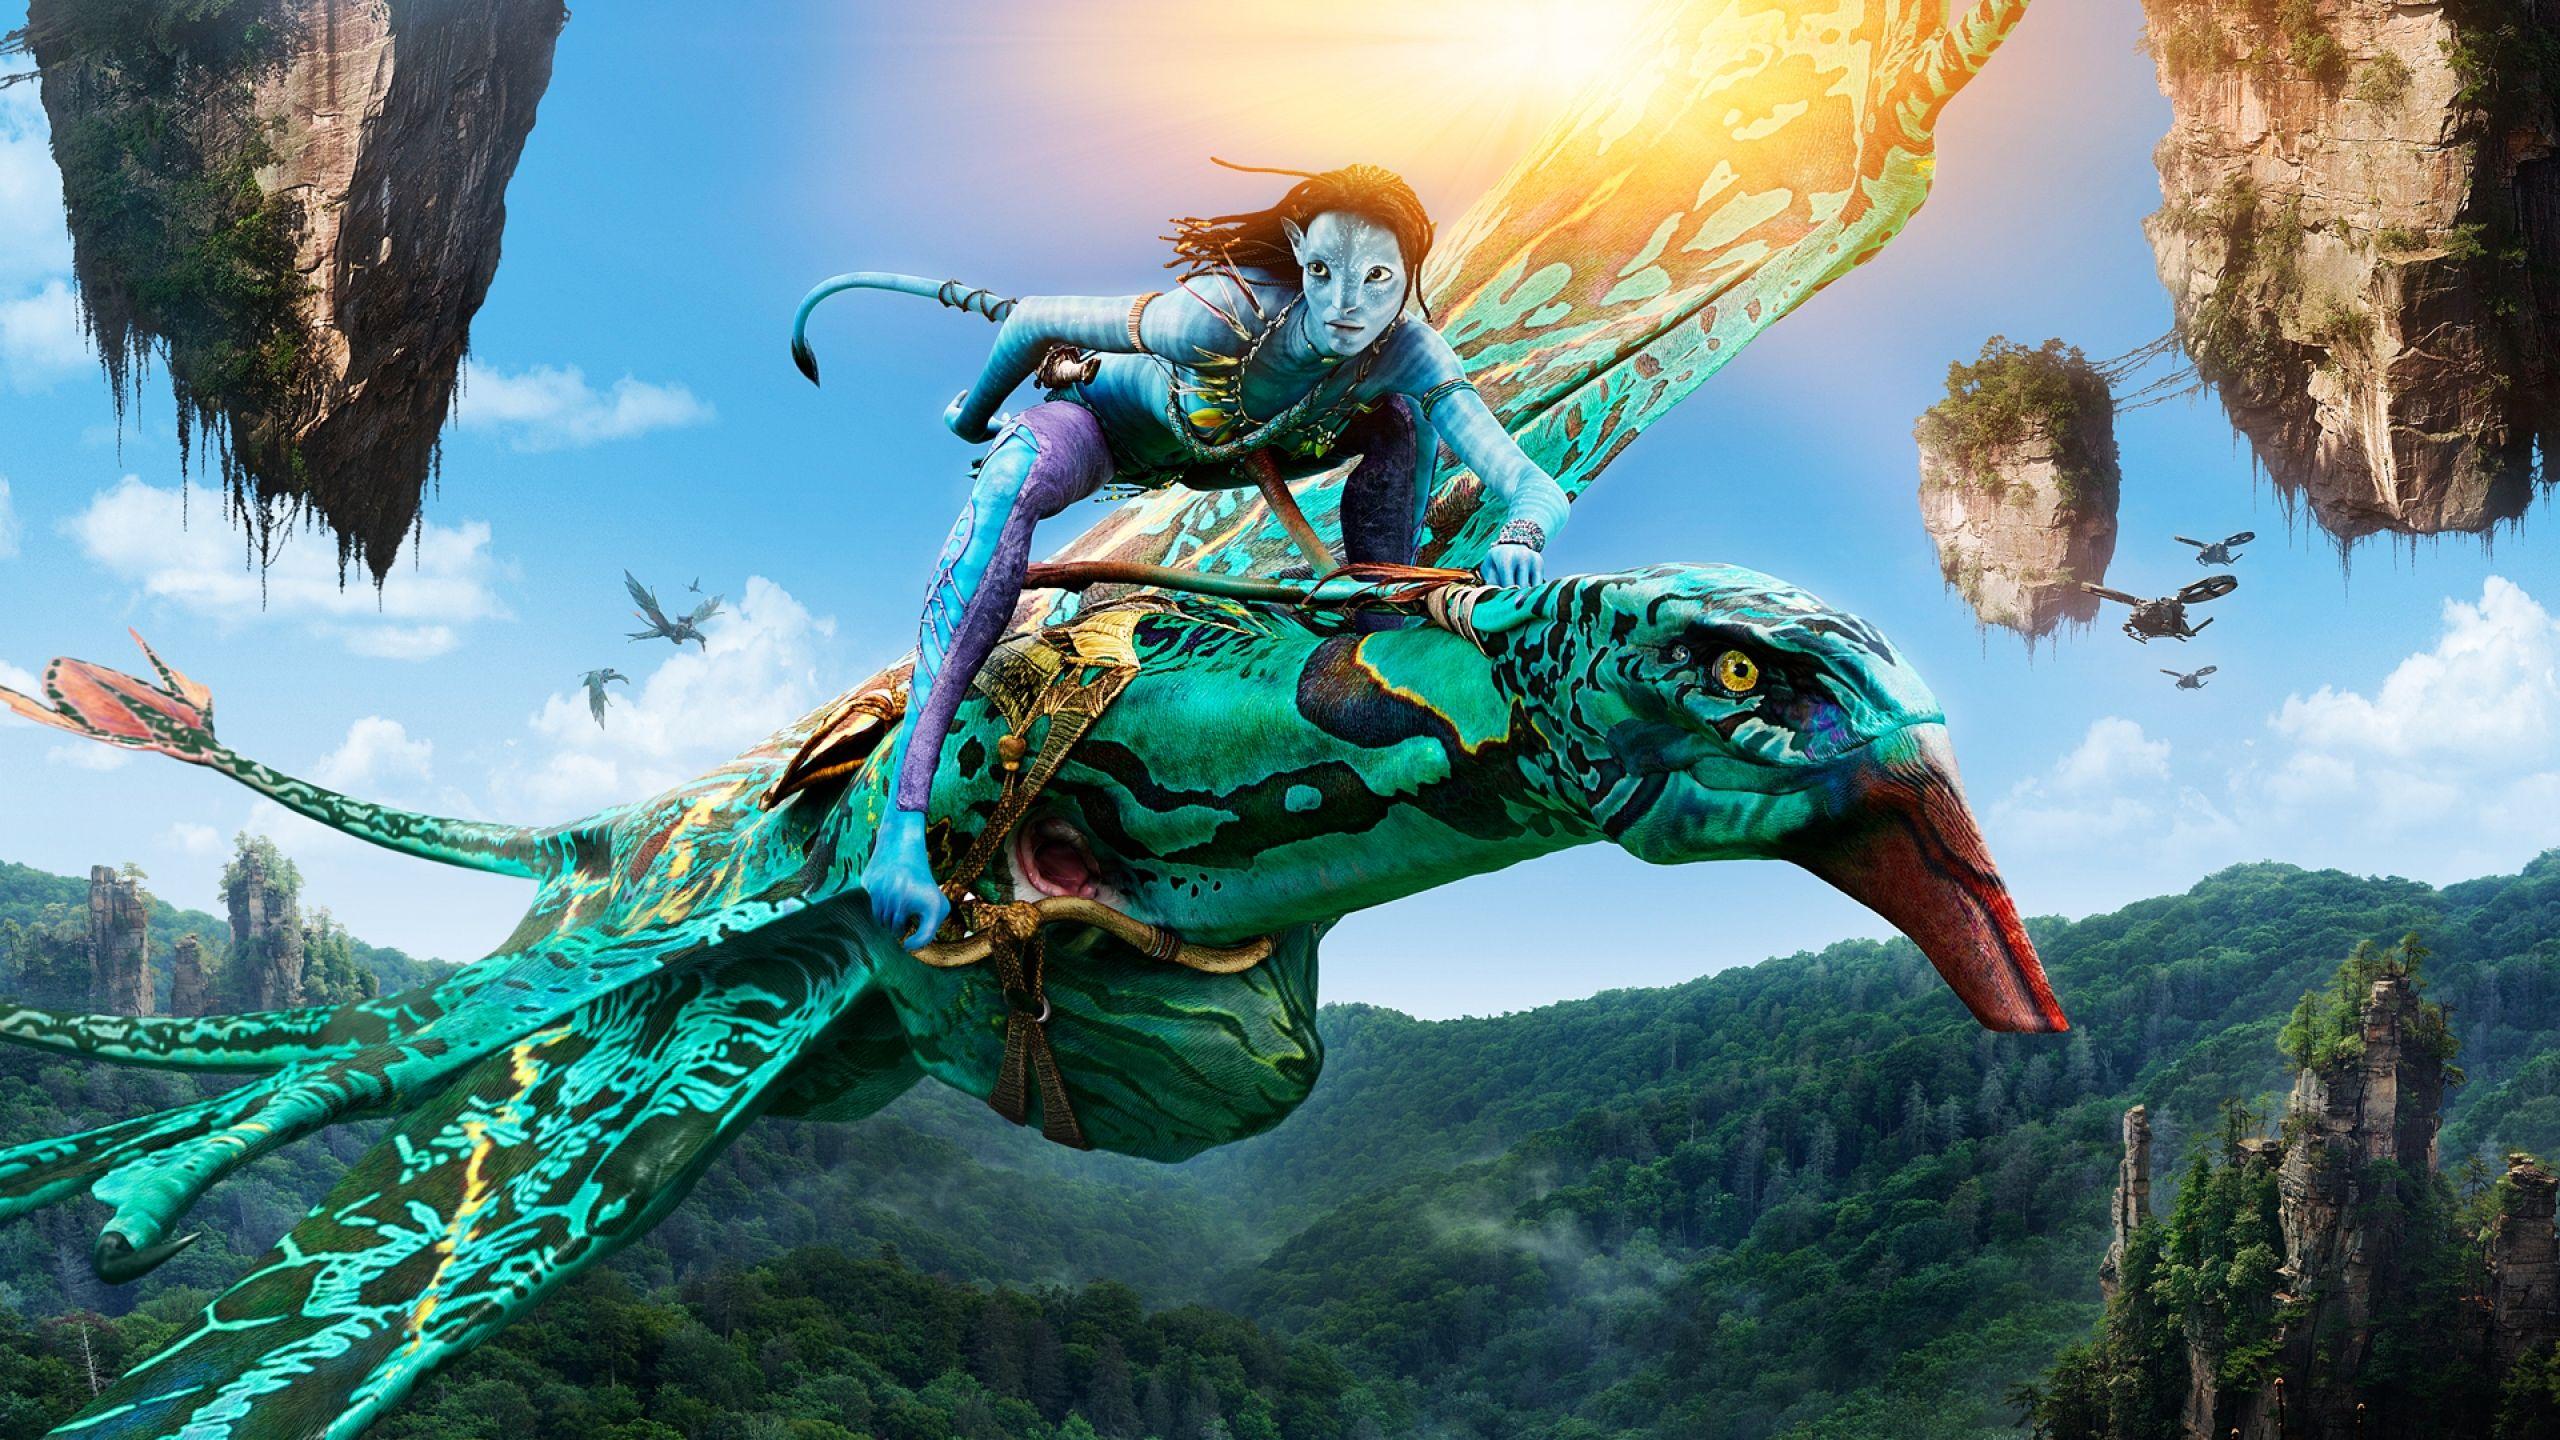 Wallpaper Neytiri Seze Avatar Hd Movies 4115: Neytiri On Seze, From James Cameron's Avatar